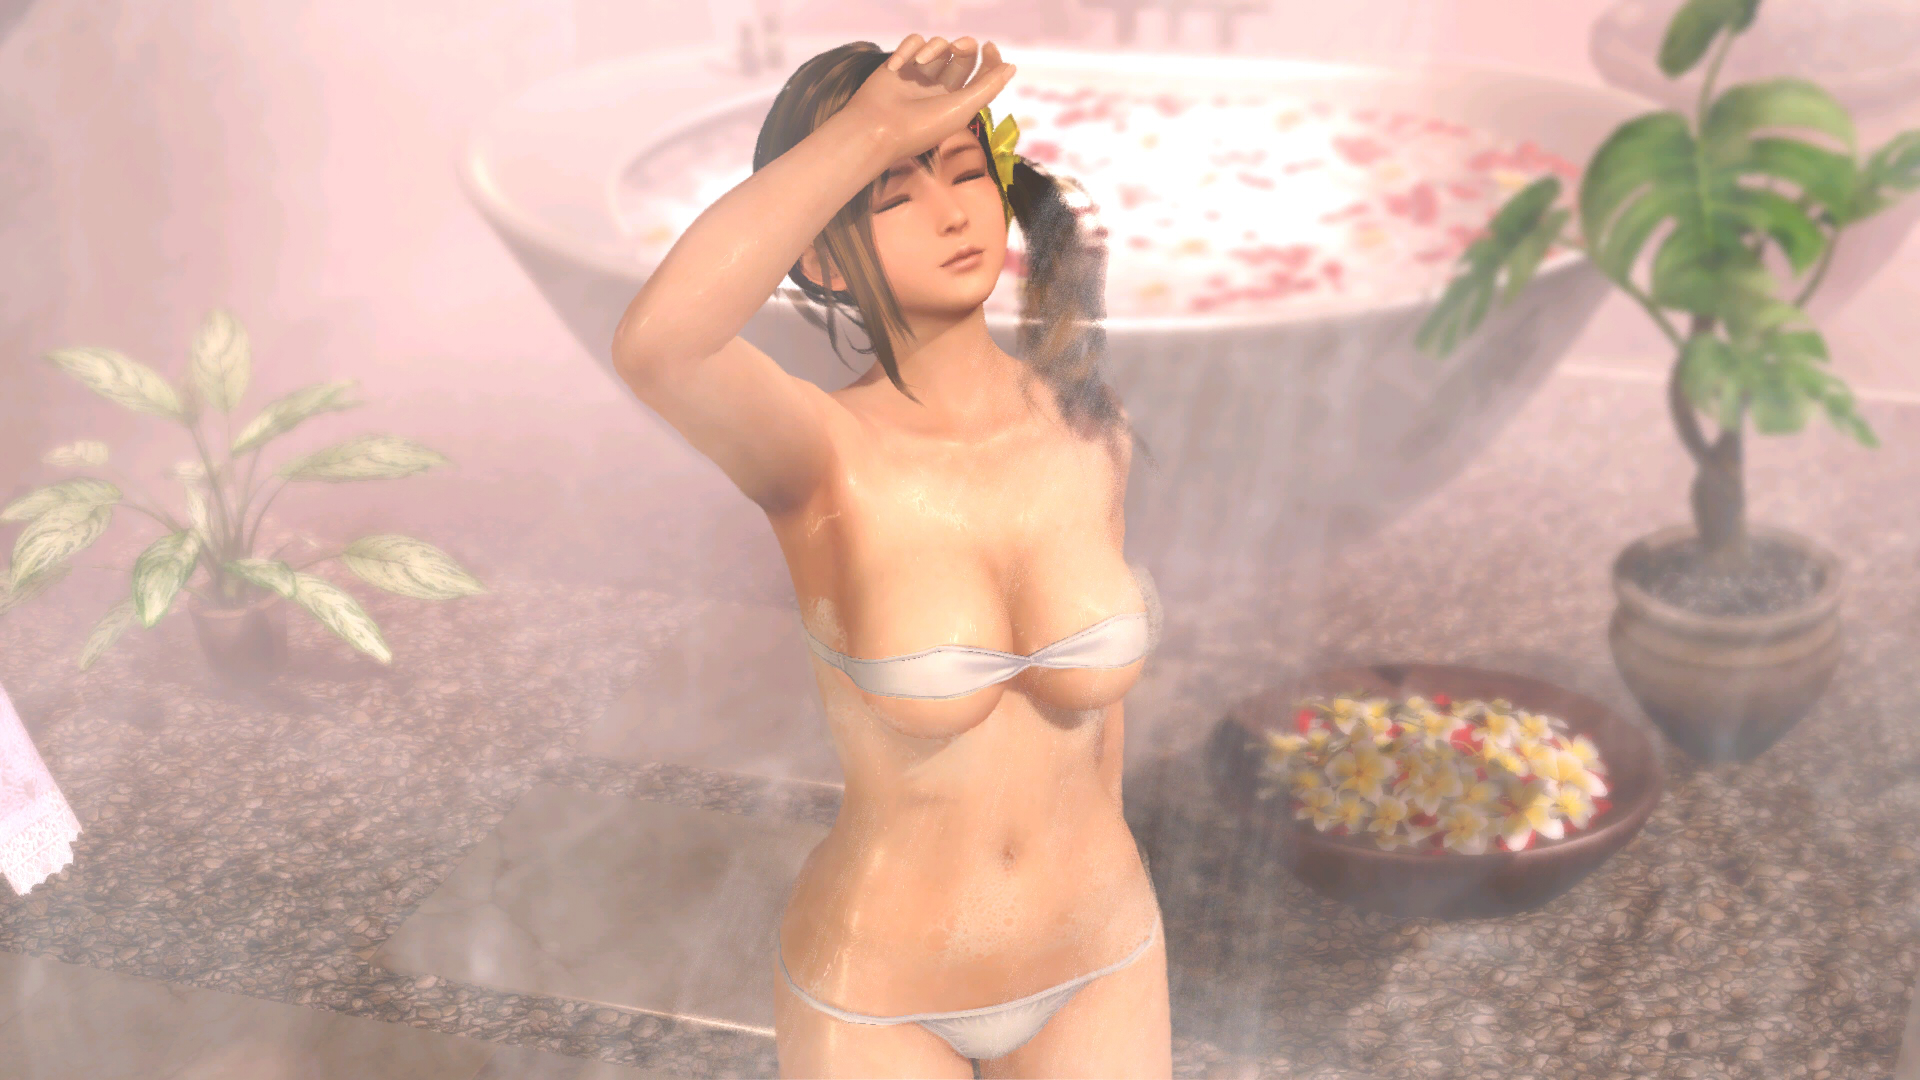 fuwamoko_misaki_fullskill.jpg